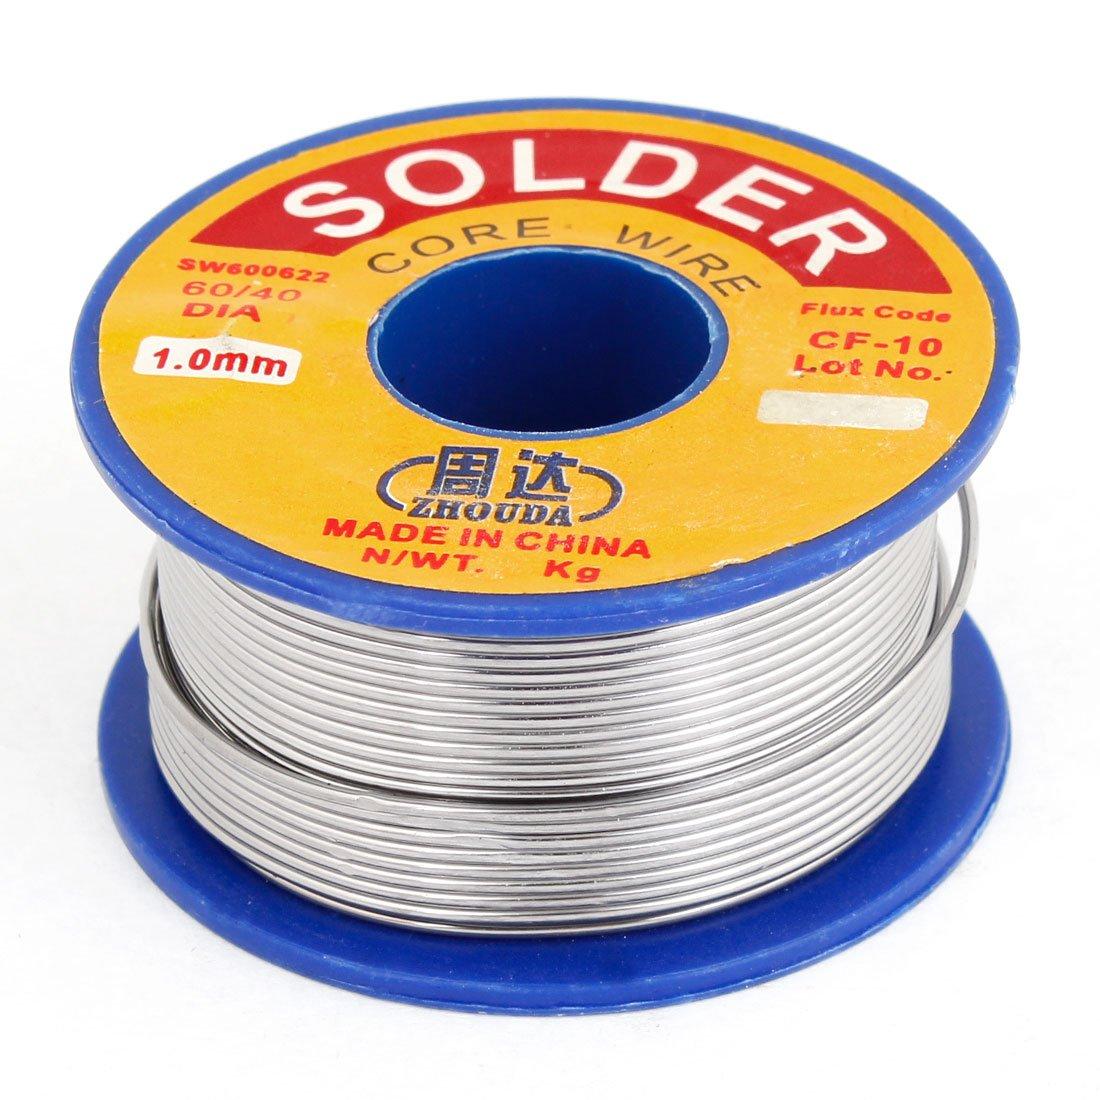 Promotion! 1mm Diameter Tin Lead Rosin Core Solder Soldering Wire Reel 1mm 500g rosin core solder 60 40 tin lead 2 0